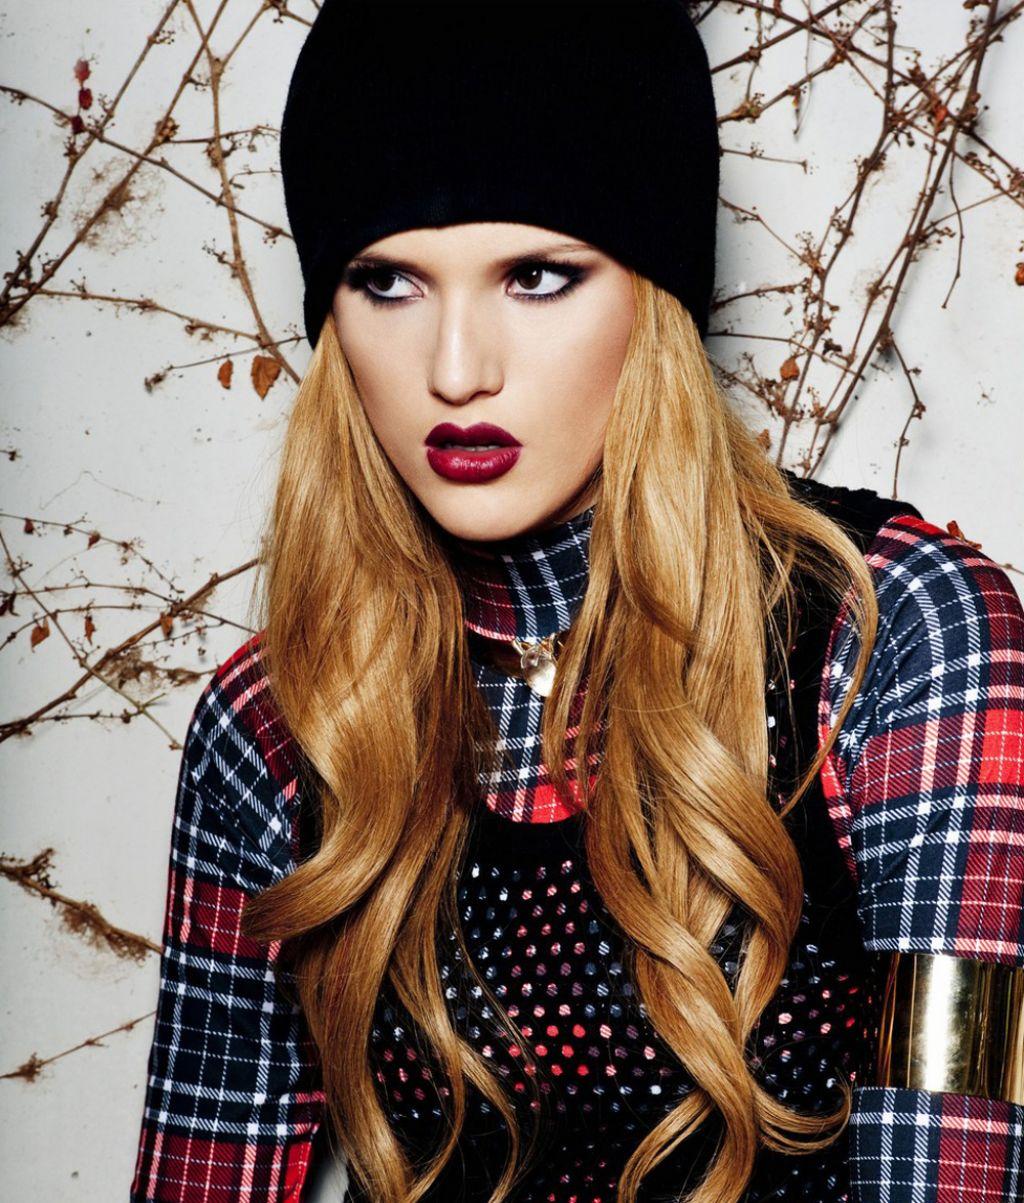 Bella Thorne Photoshoot - Justin Campbell 2013 • CelebMafia